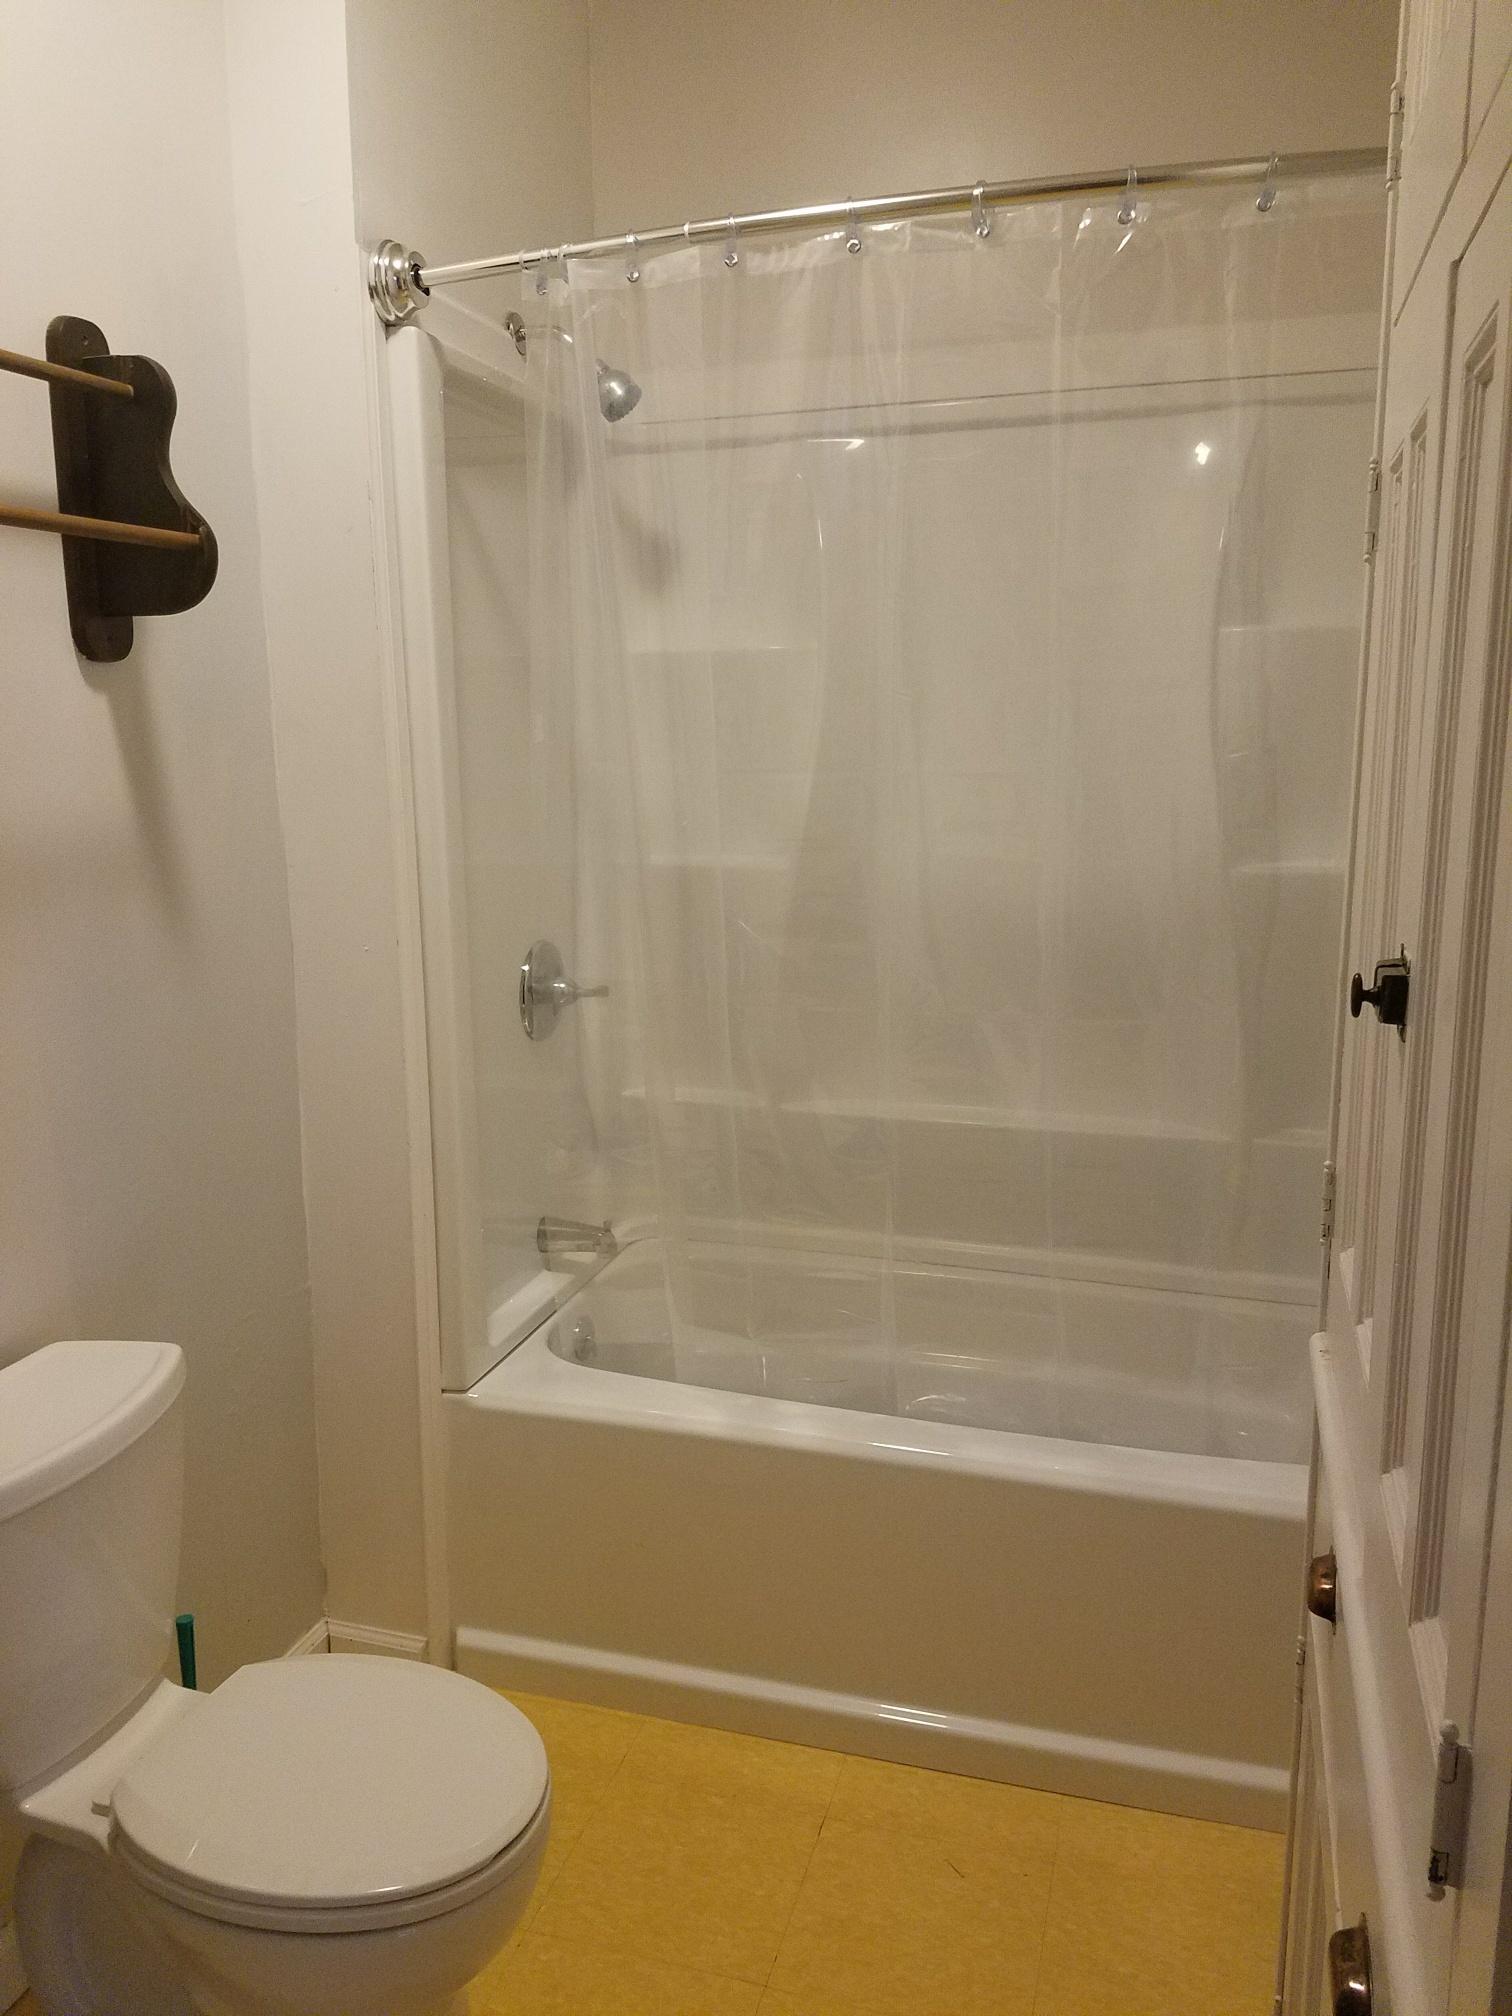 Apartment Shower